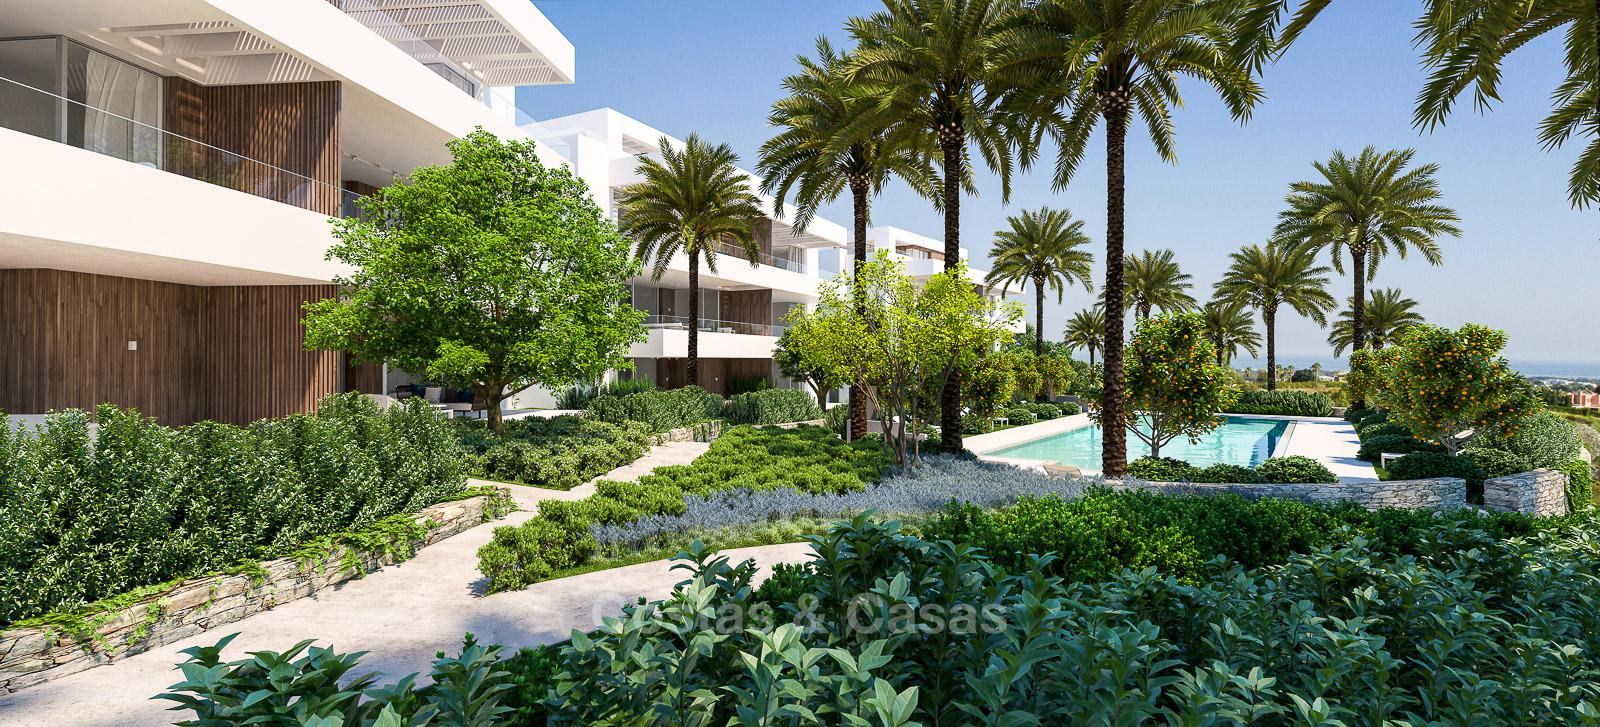 Brand new modern eco friendly apartments for sale Benahavis Marbella